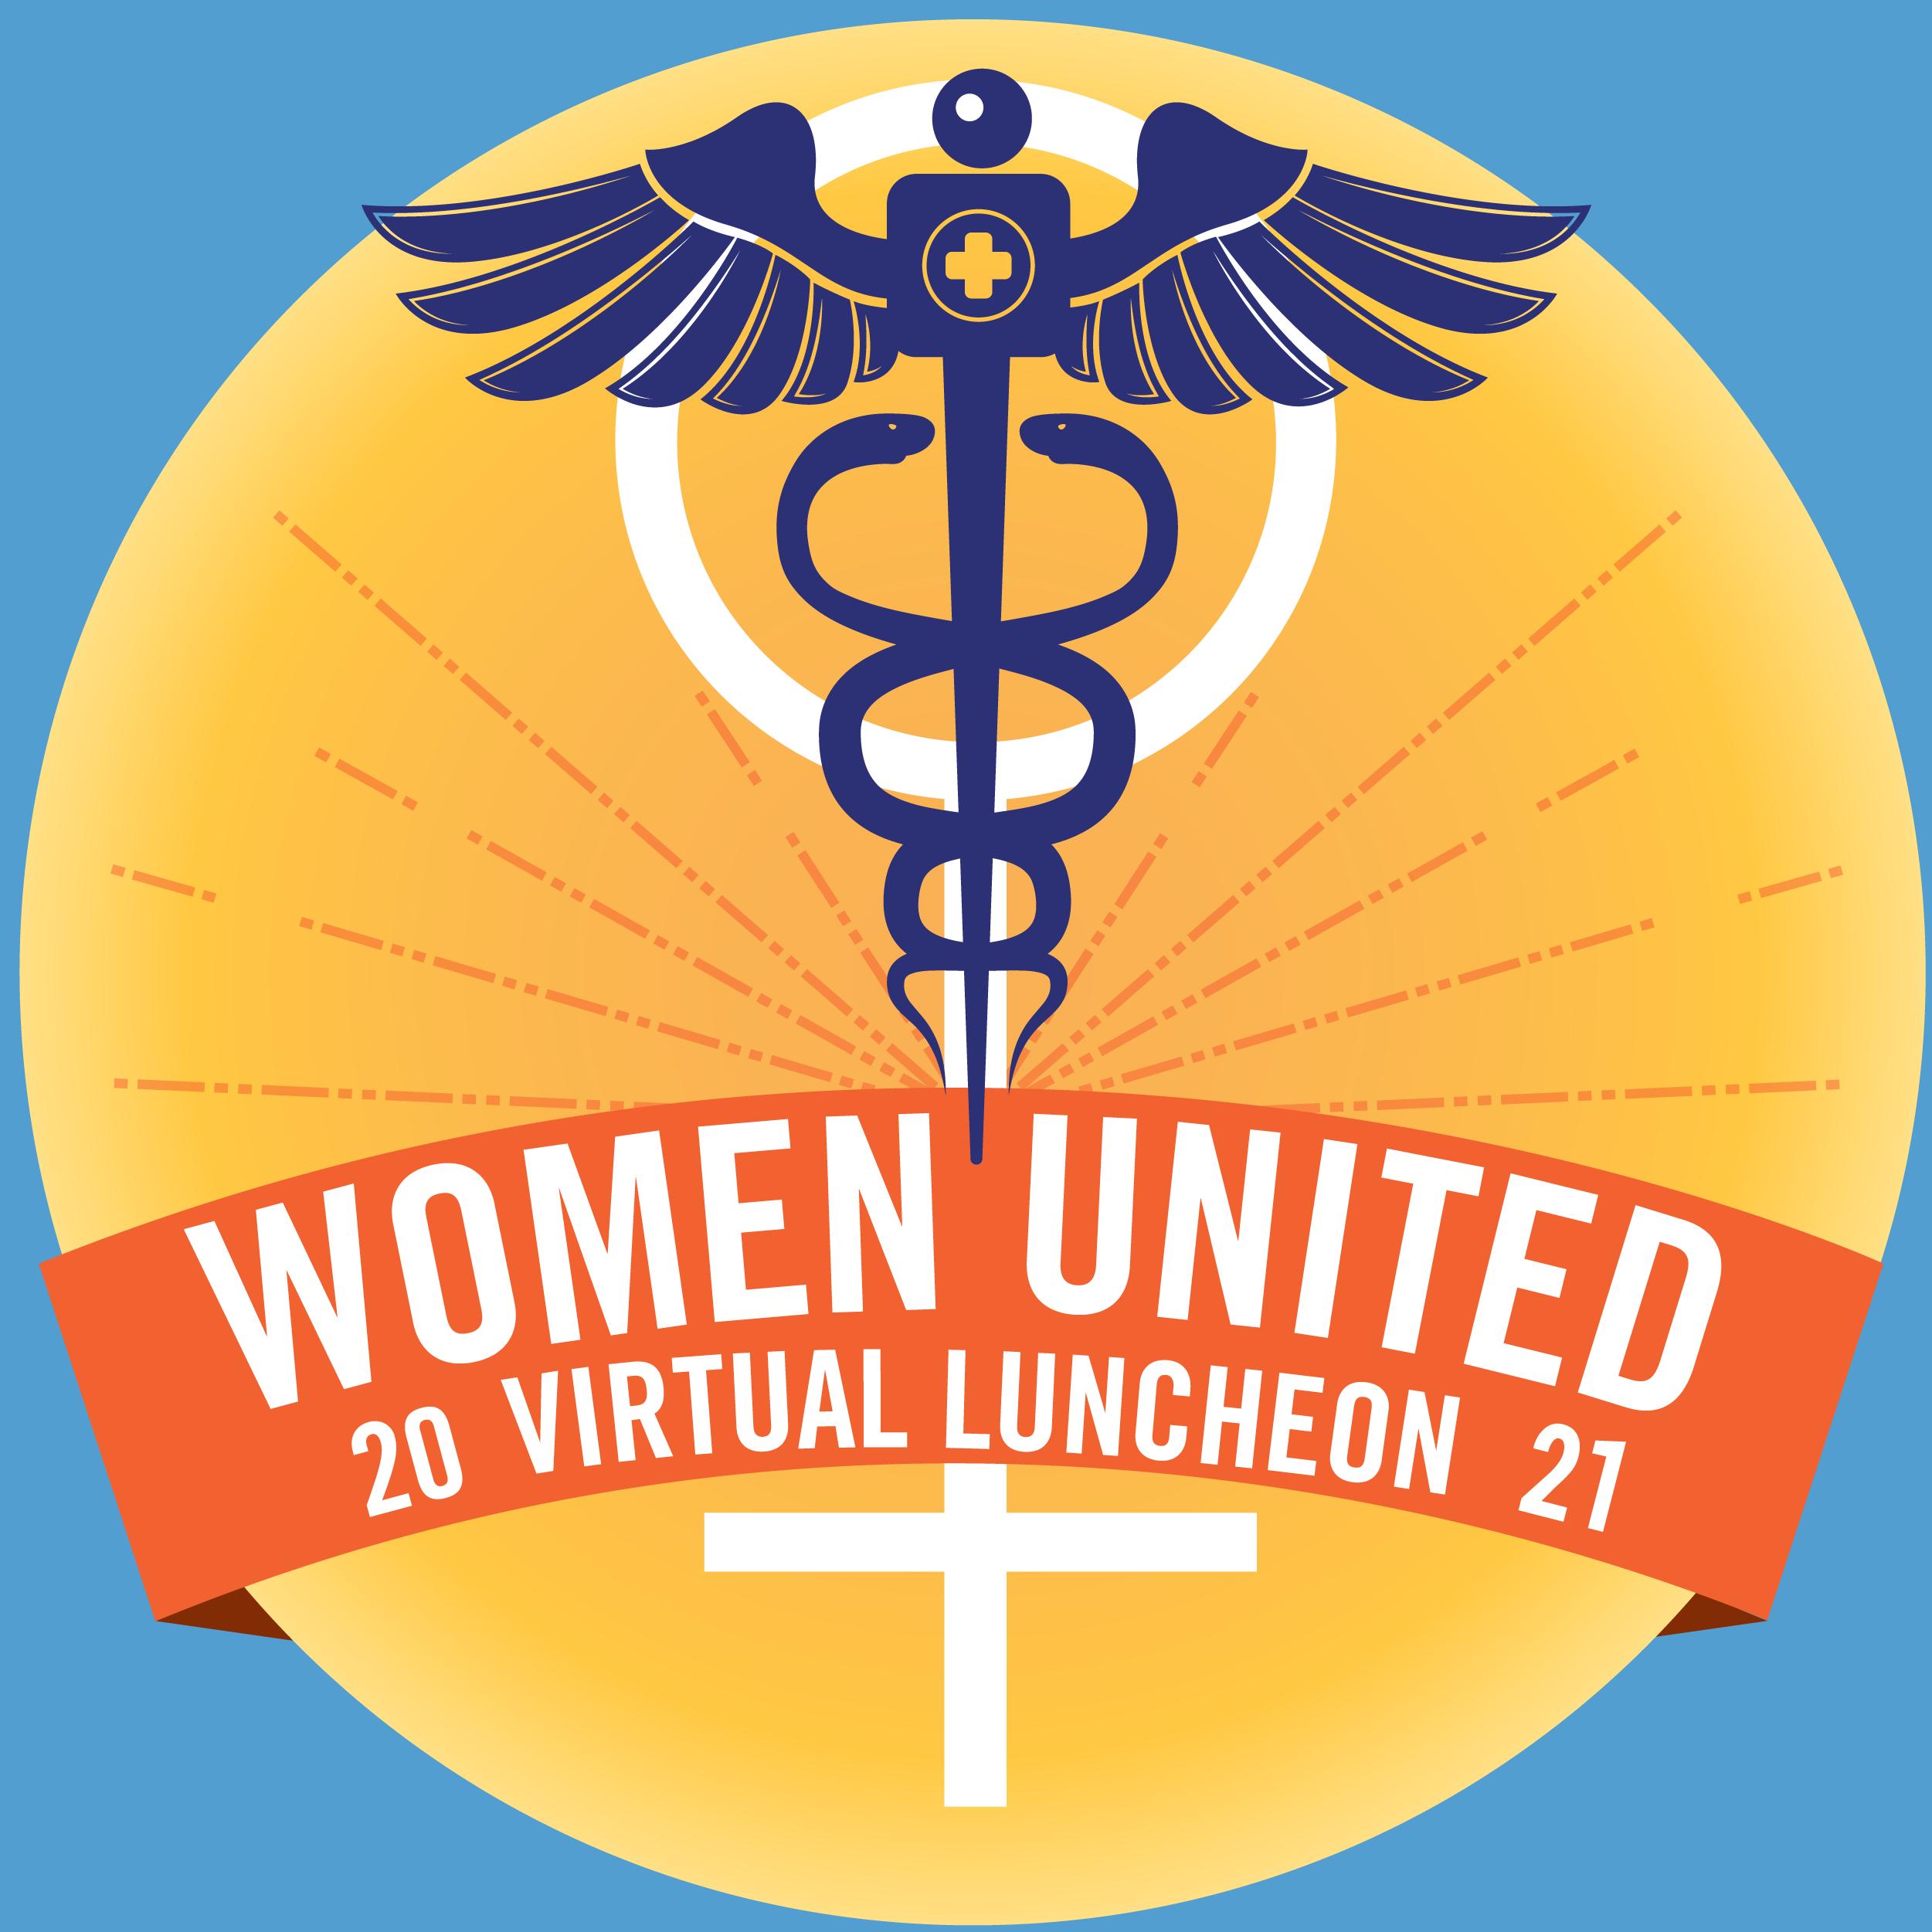 Women United Luncheon